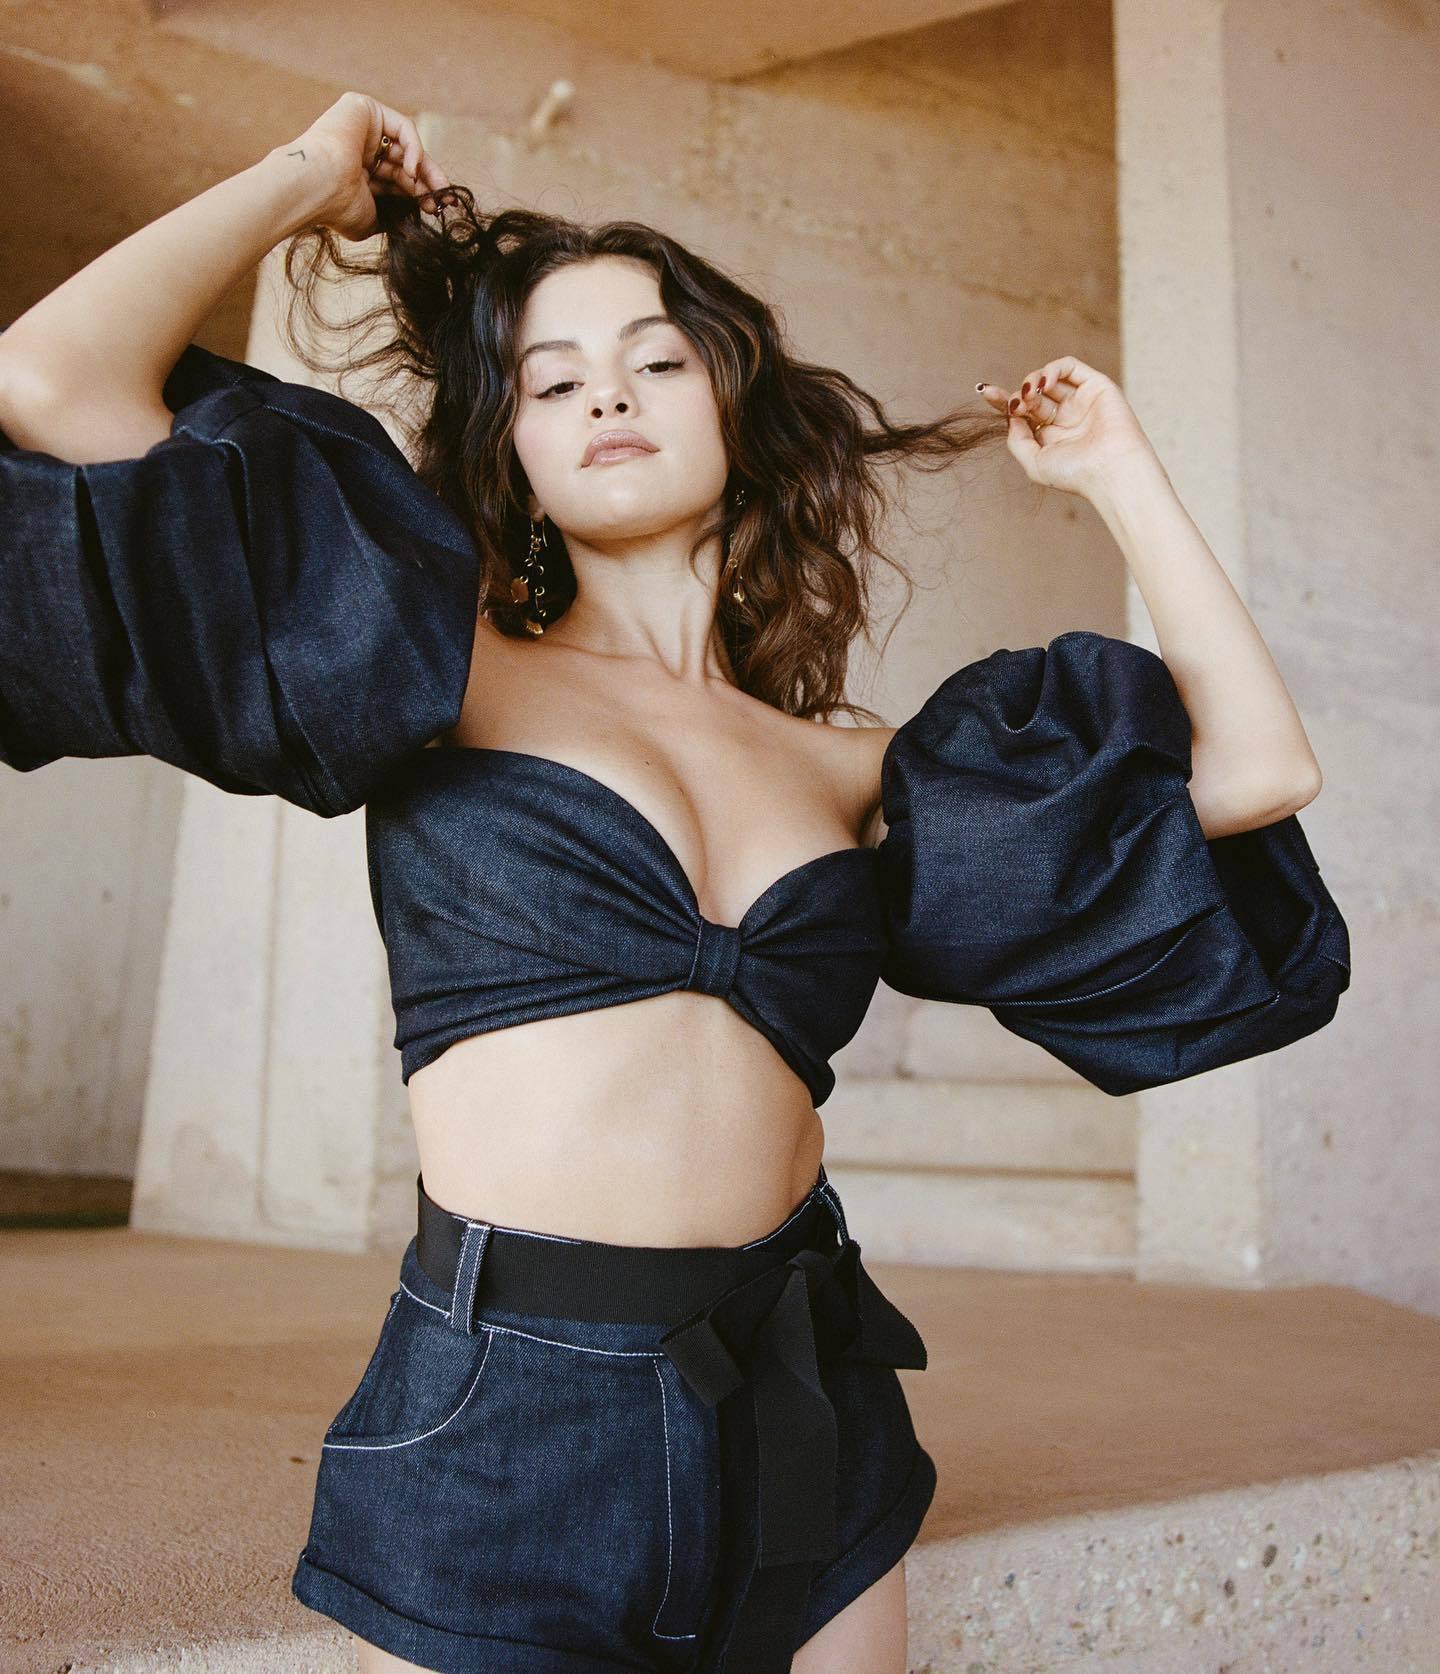 Selena Gomez - Beautiful Boobs in Sexy Photoshoot for